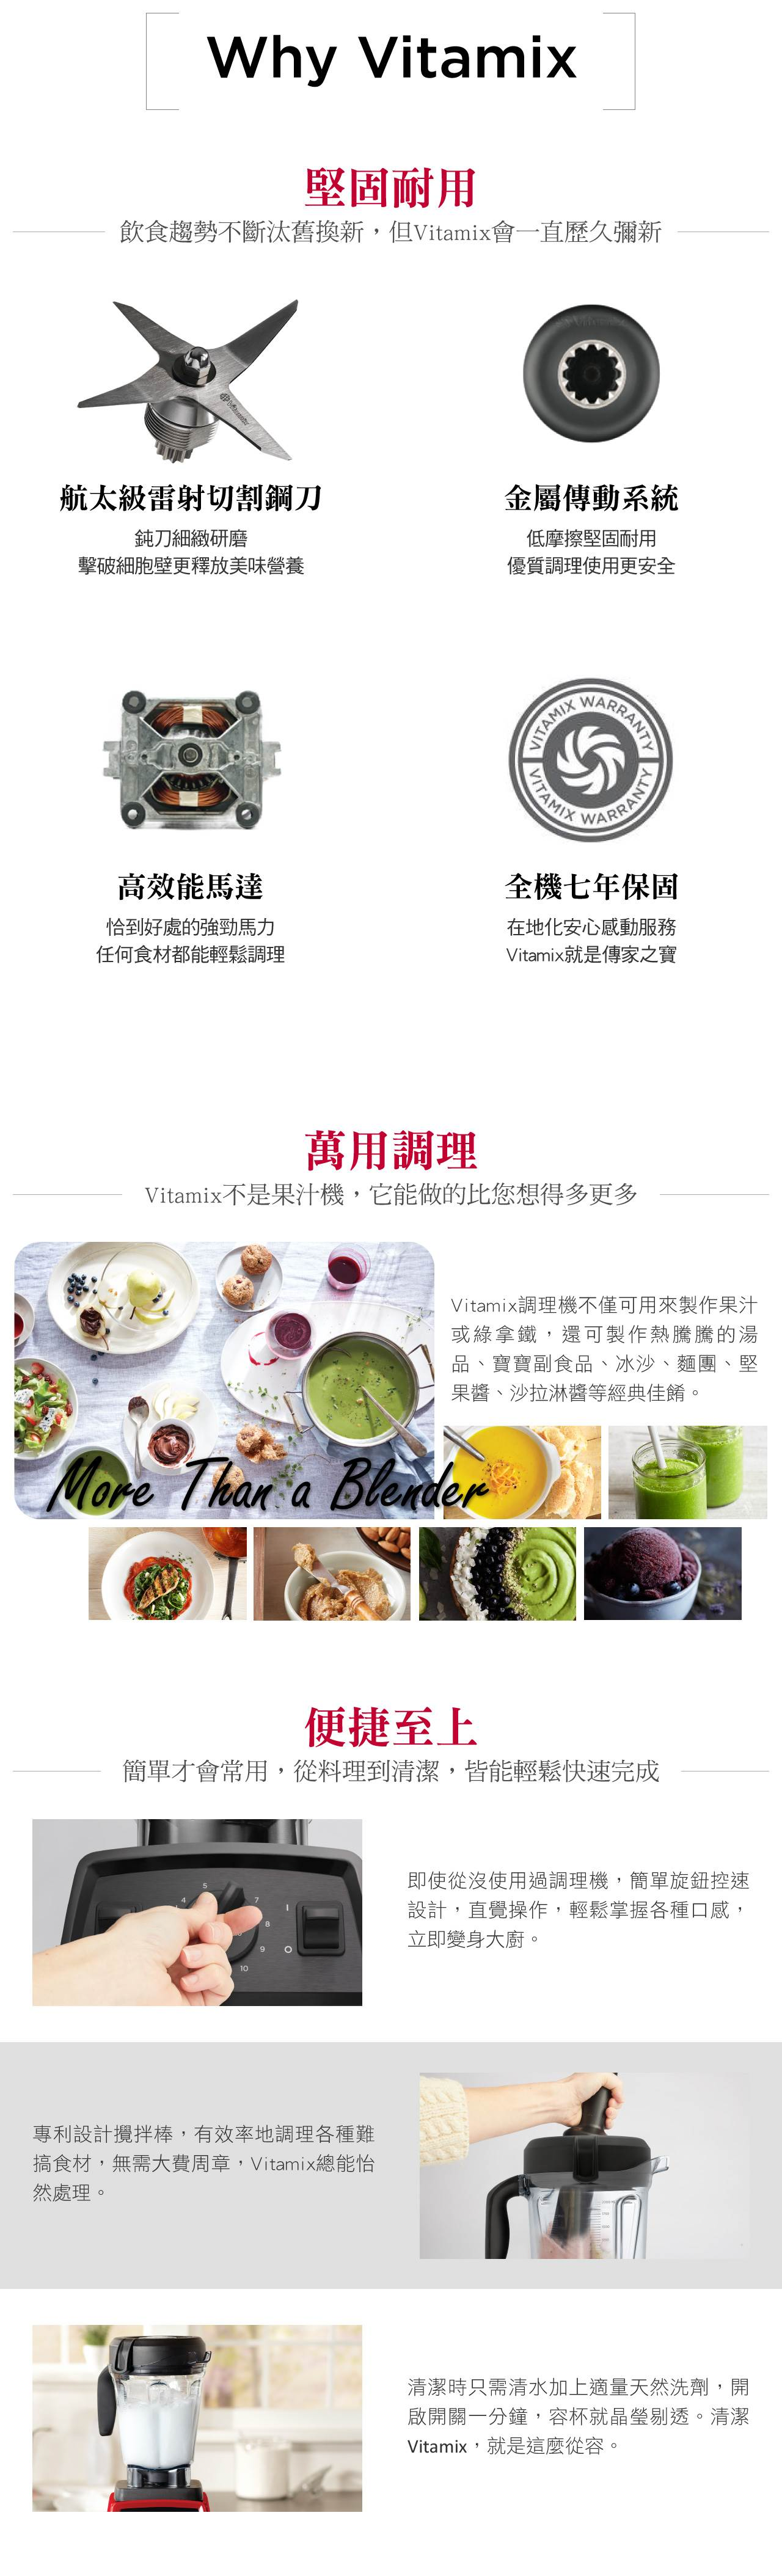 Vitamix-E320調理機-堅固耐用與萬用調理